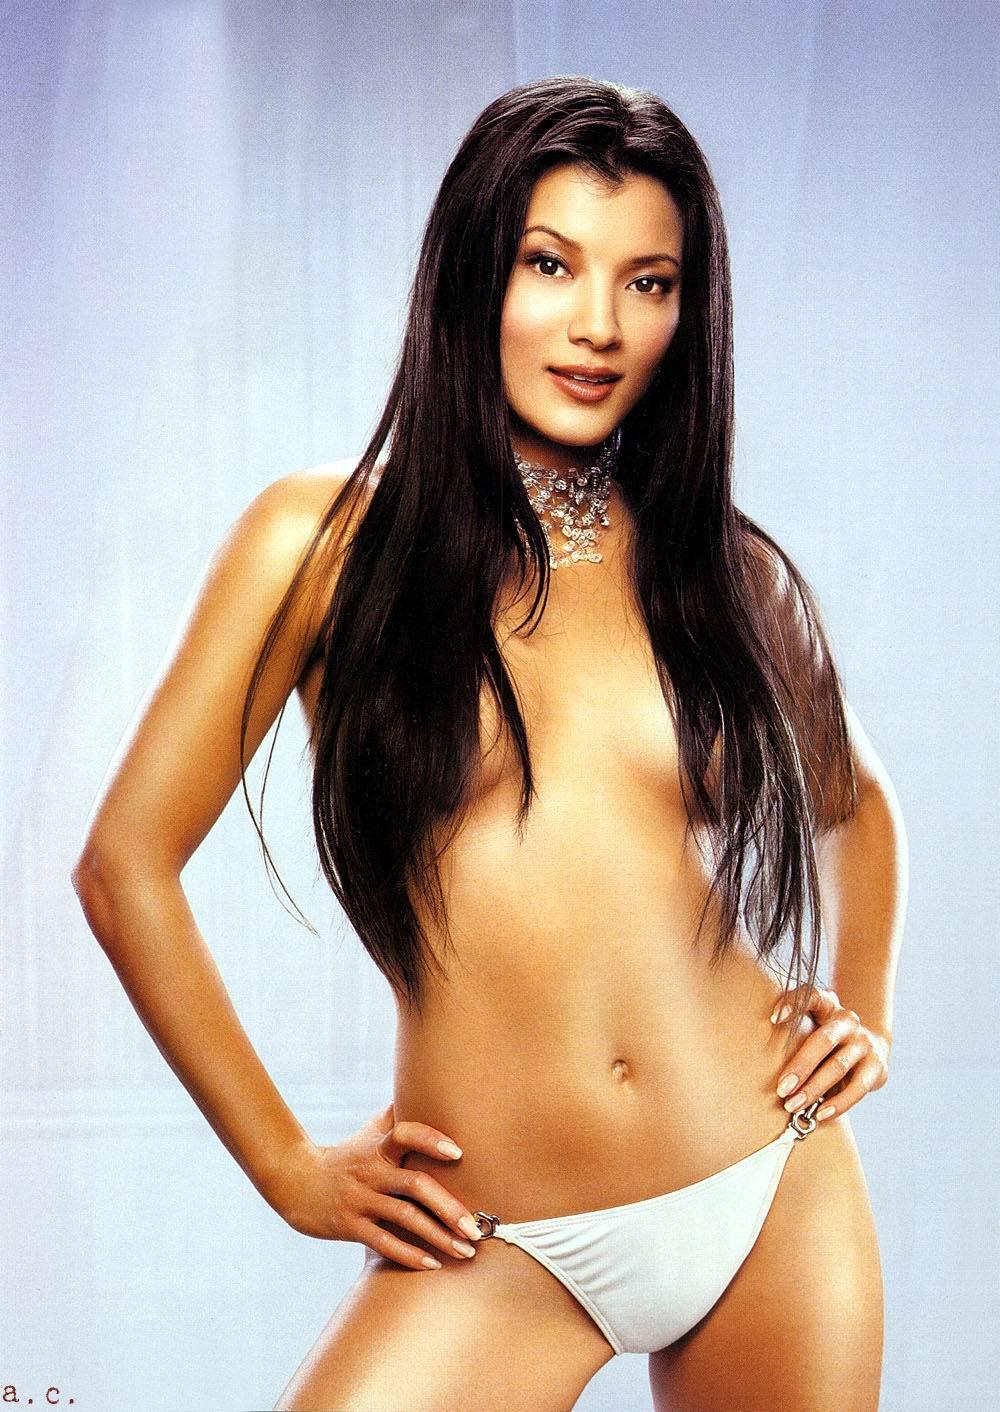 Kelly Hu XXX Video suku puoli Aasian Gangbang